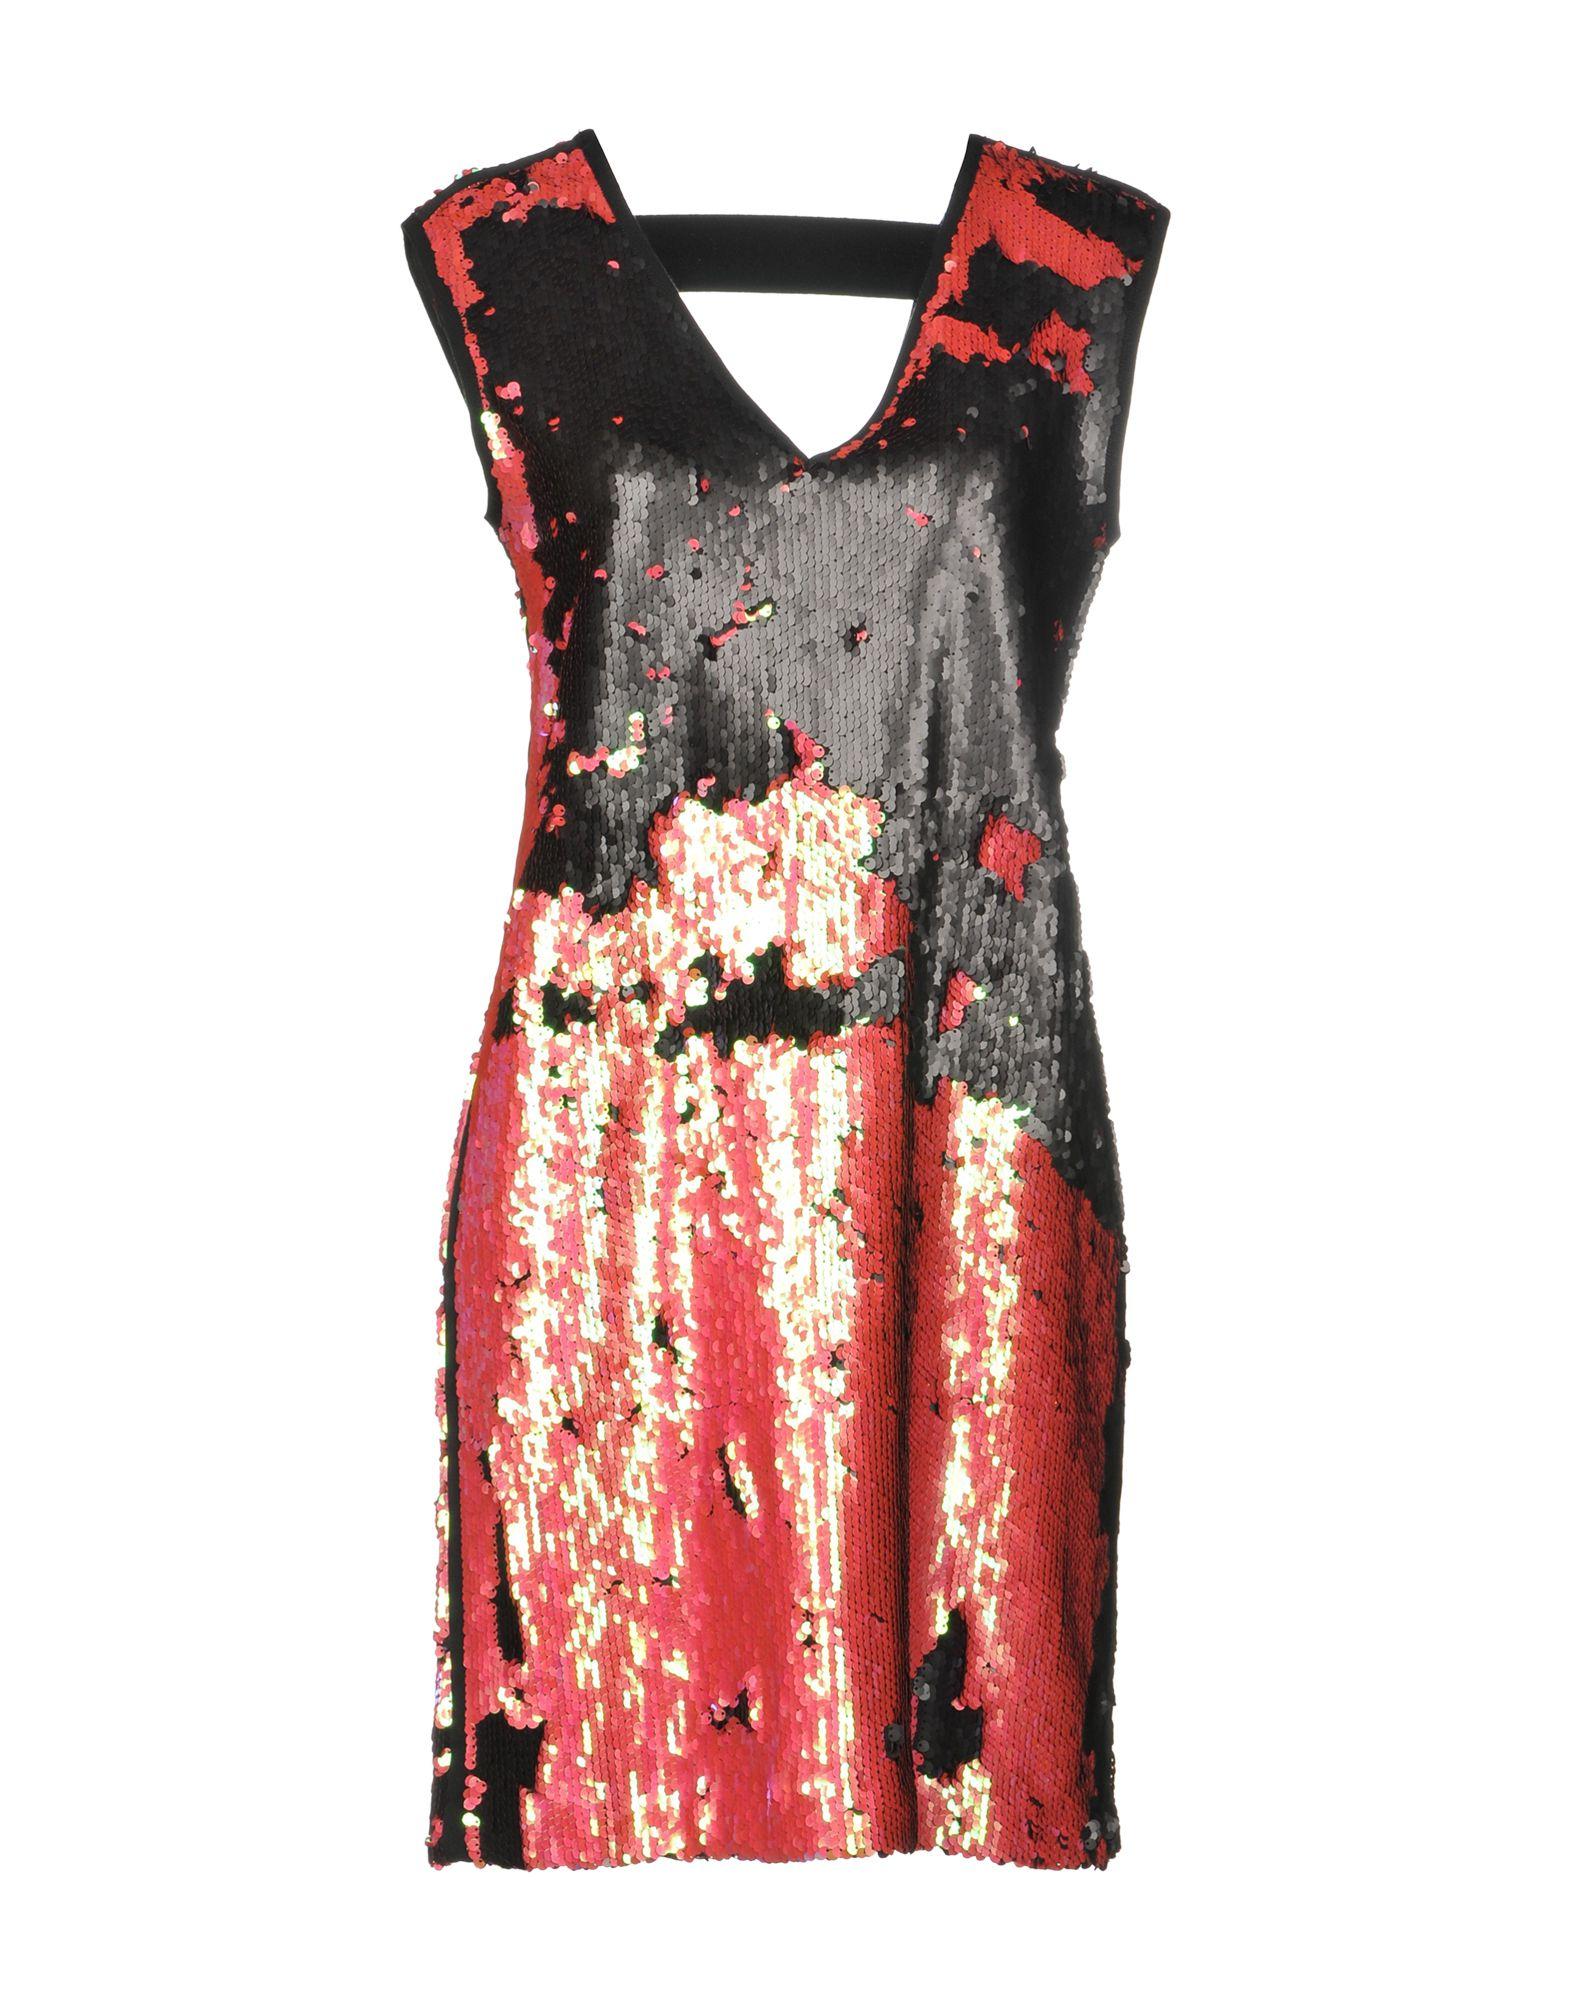 BEATRICE B Короткое платье платье нижнее платье beatrice b платье нижнее платье